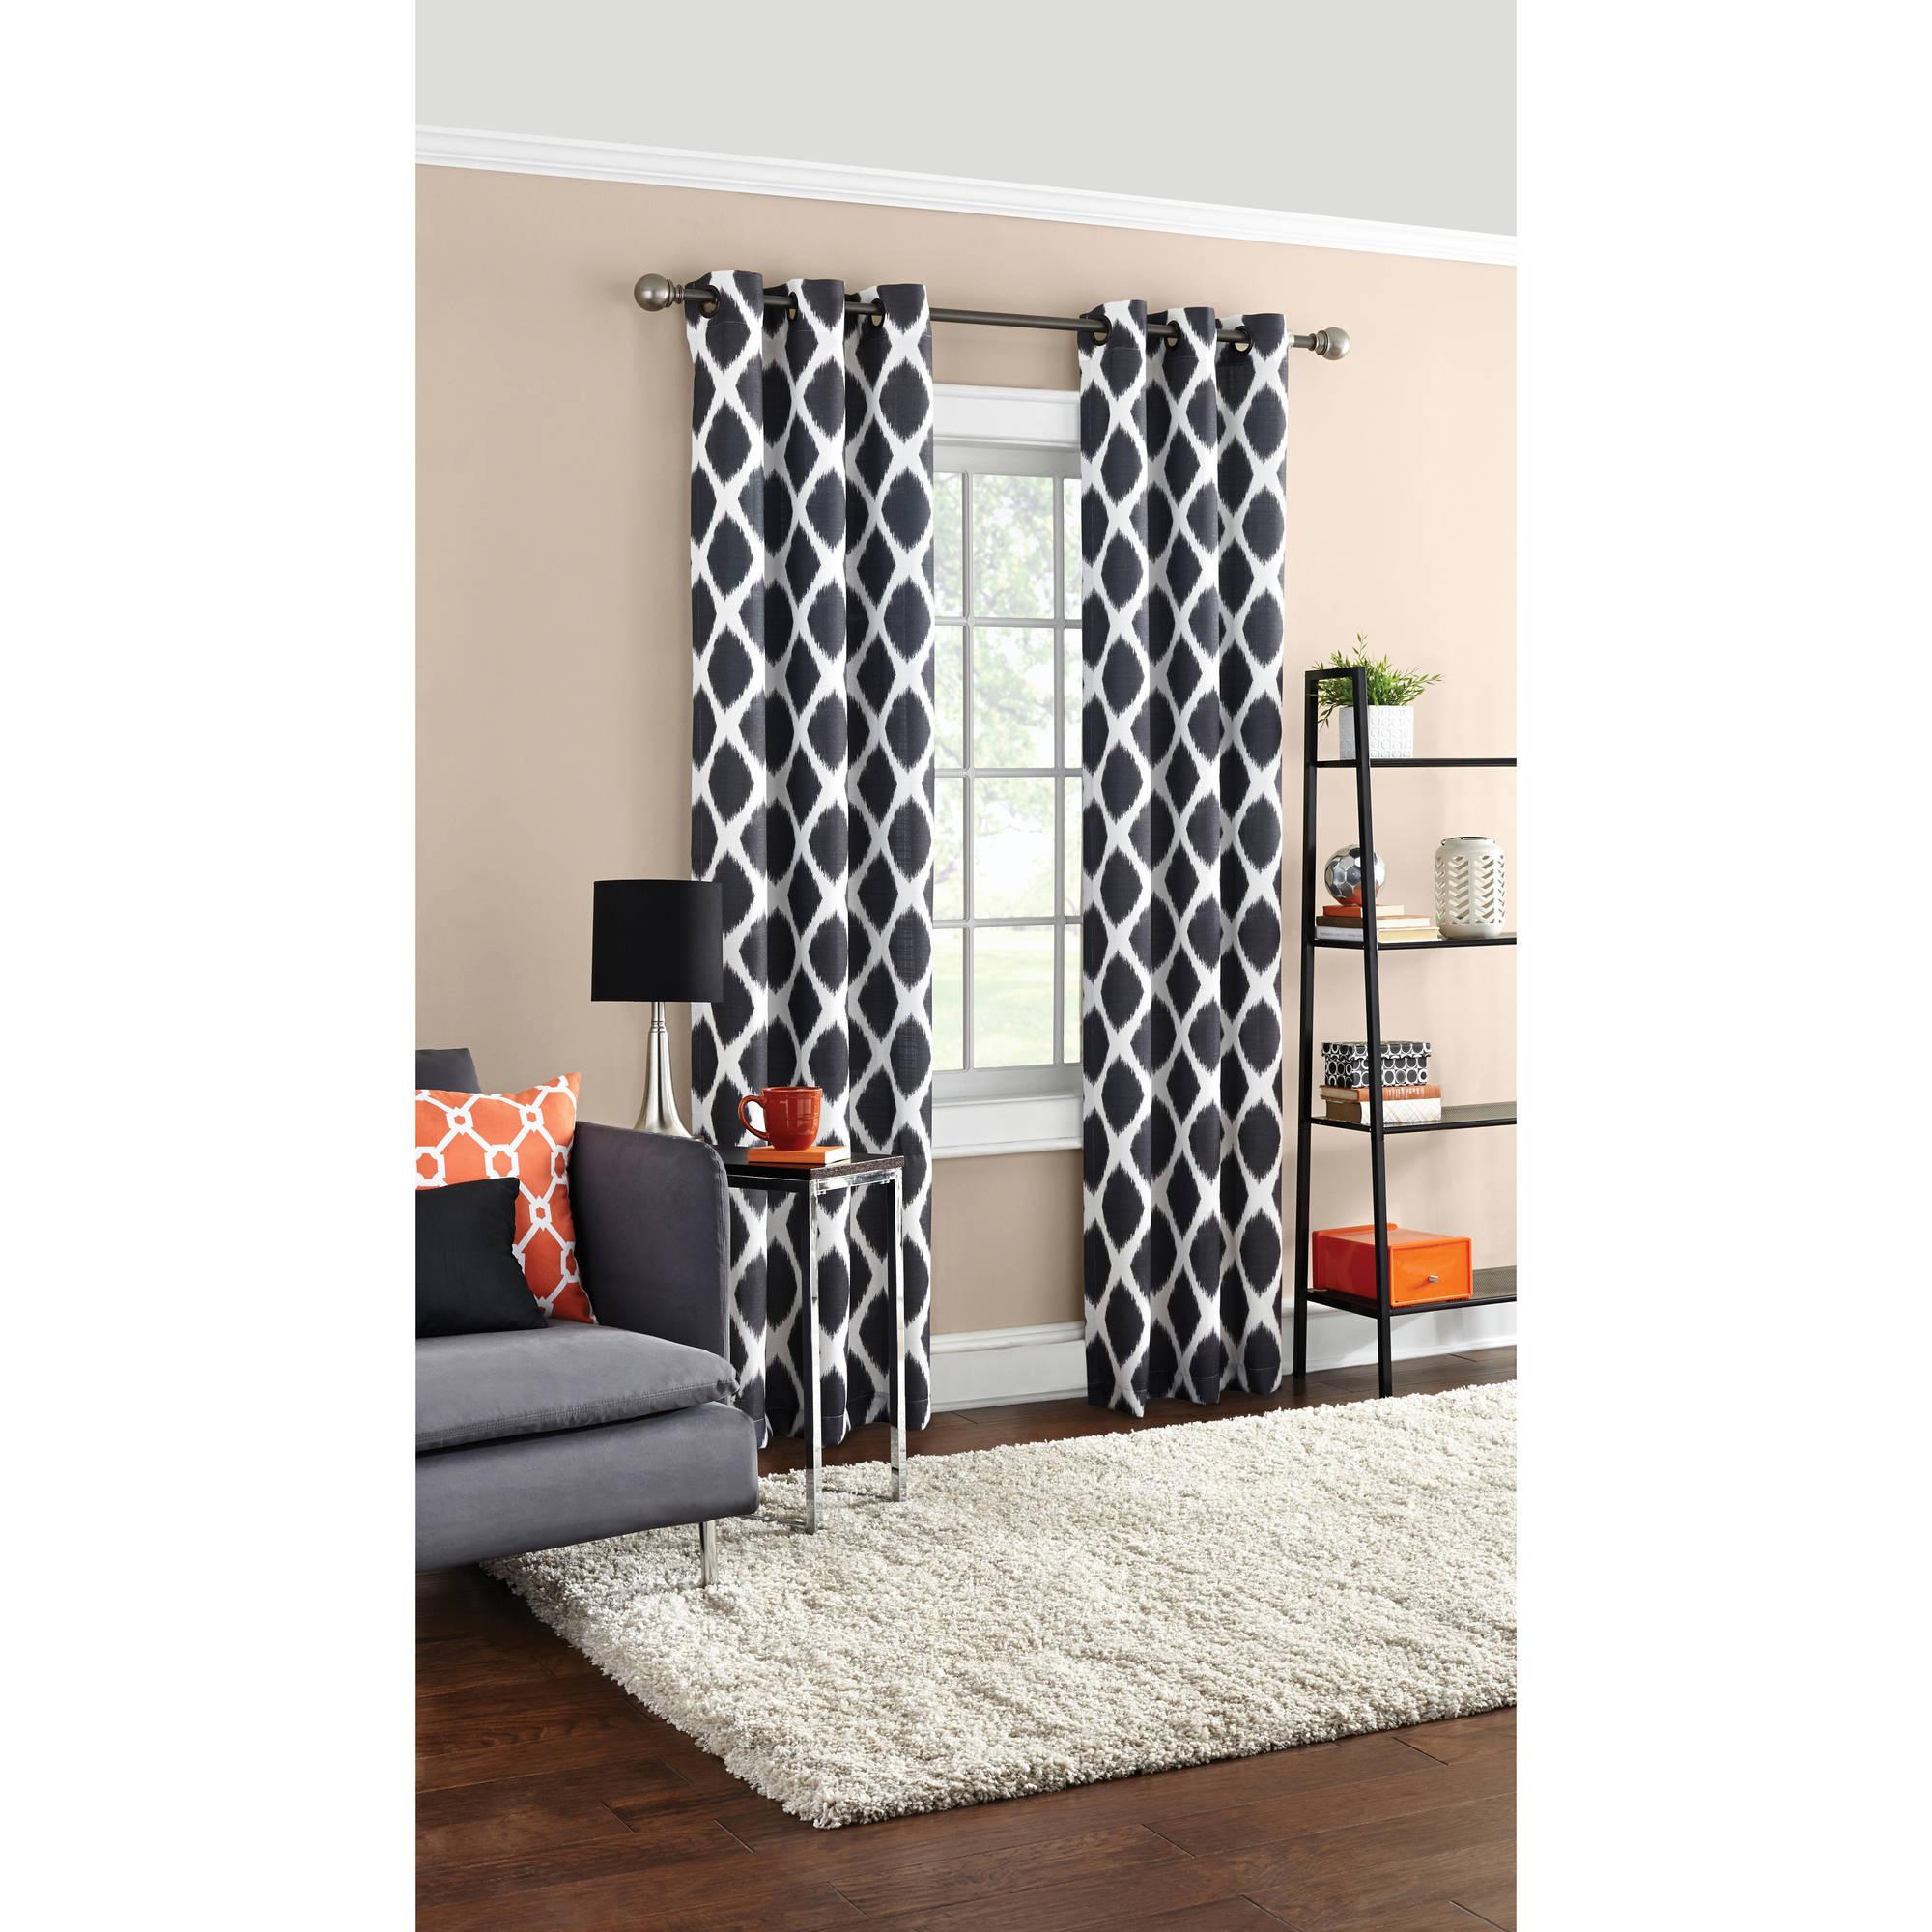 Mainstays Textured Grommet Curtain Panel pertaining to Grommet Curtain Panels (Image 13 of 20)